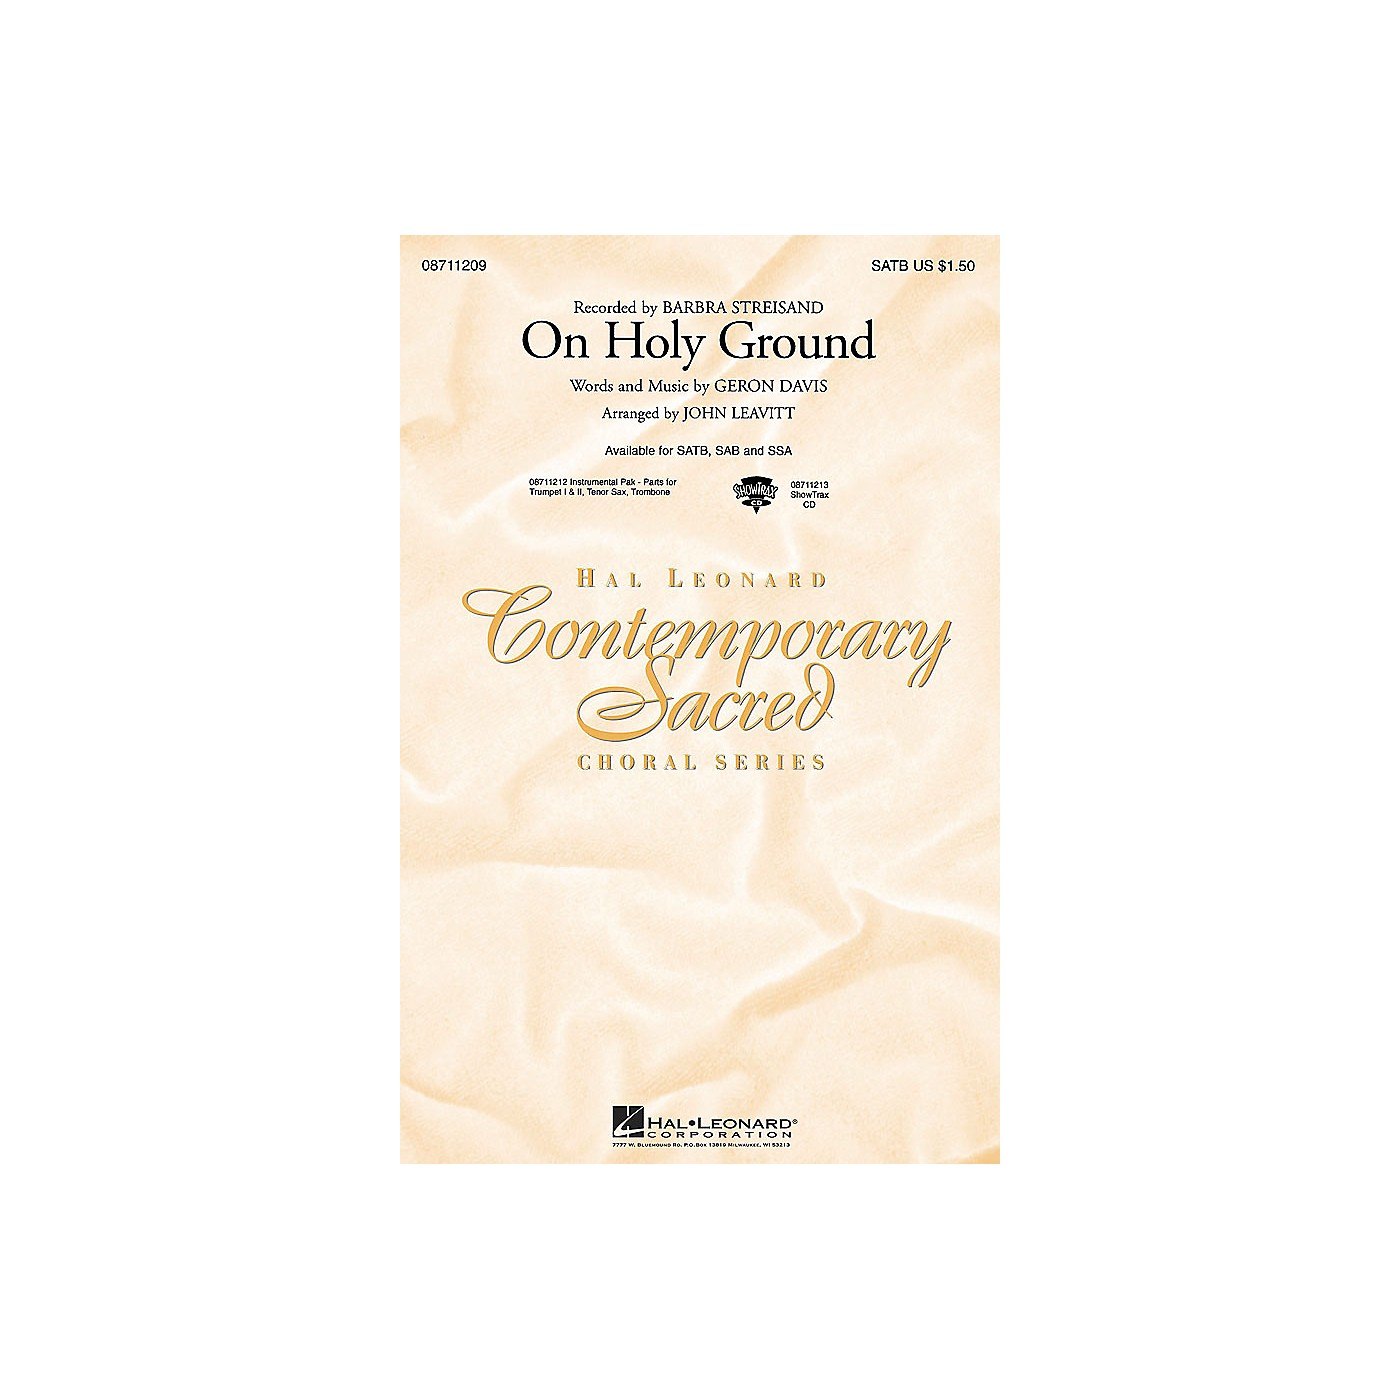 Hal Leonard On Holy Ground SATB by Barbra Streisand arranged by John Leavitt thumbnail